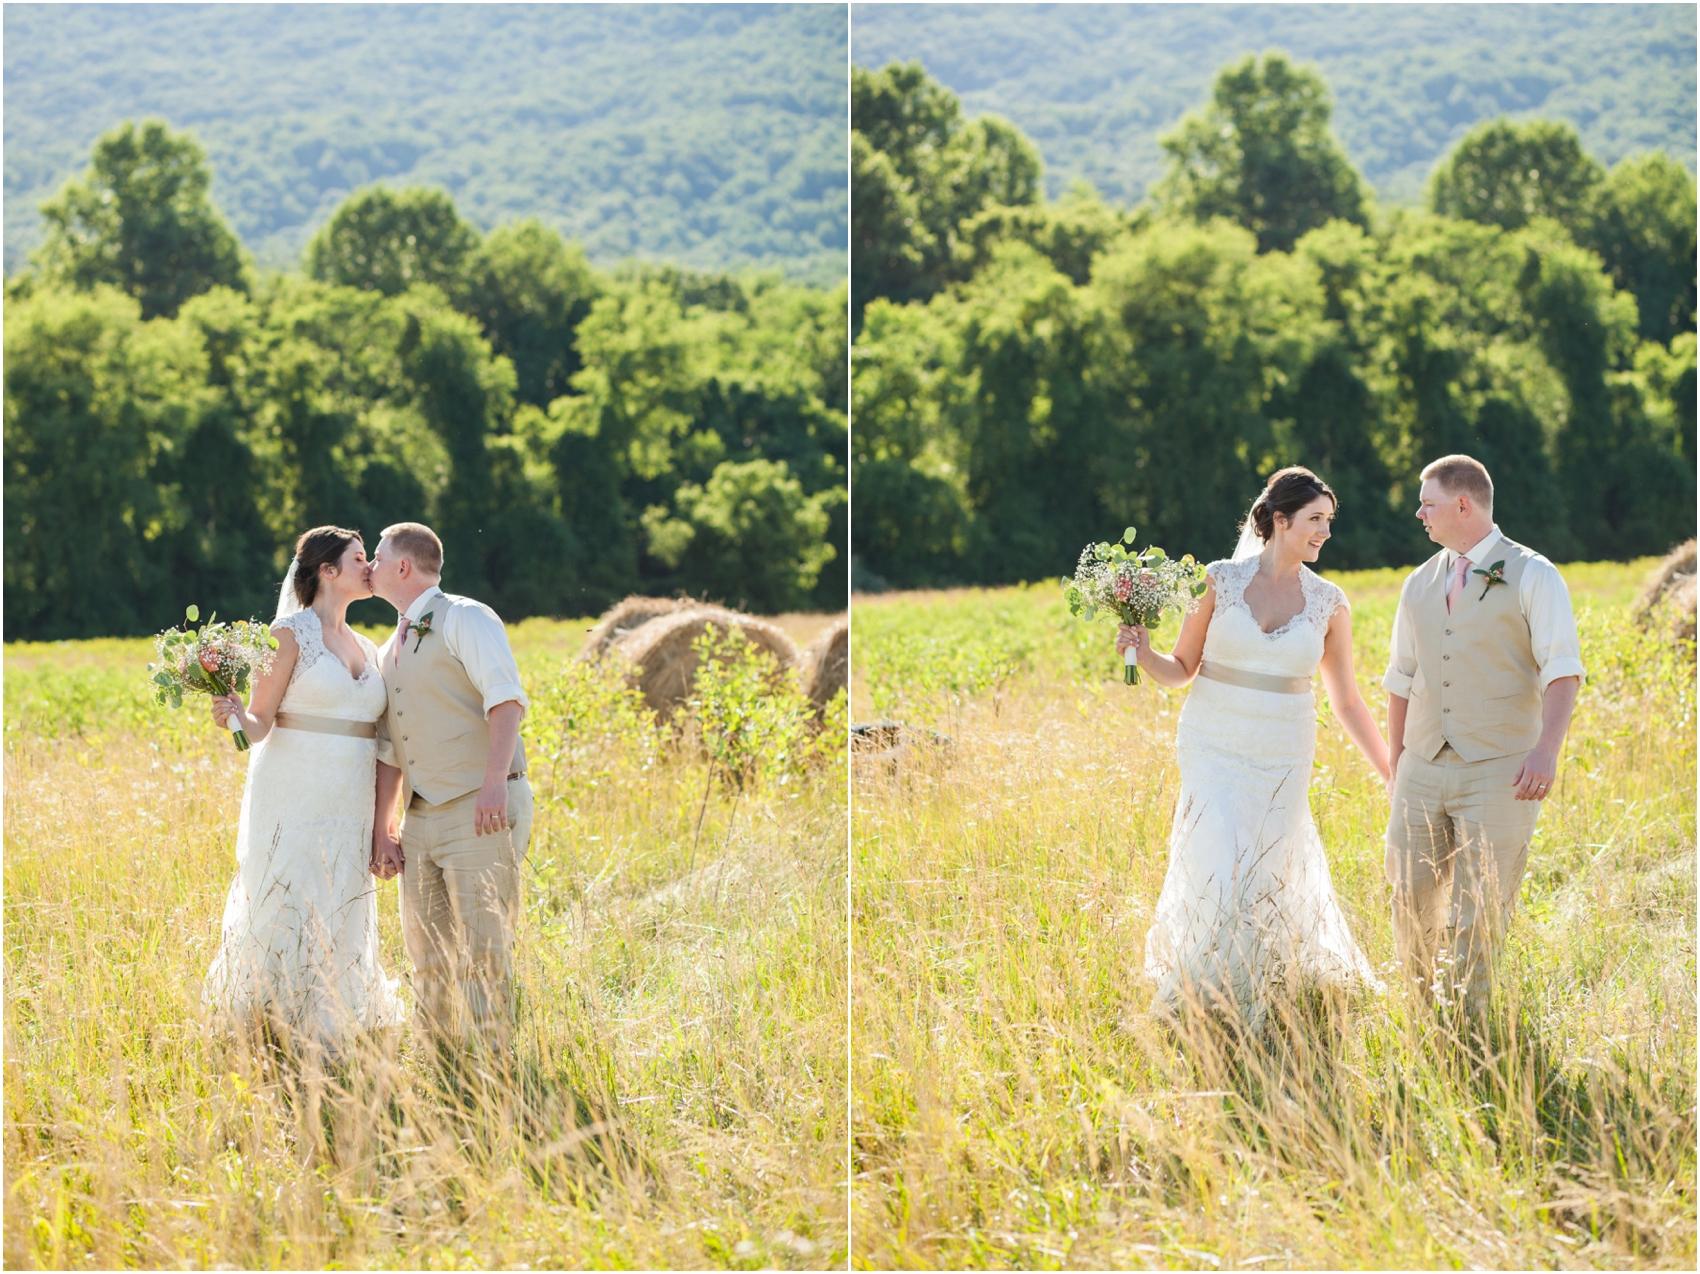 Rodes Farm Charlottesville VA Wedding-10-4.jpg